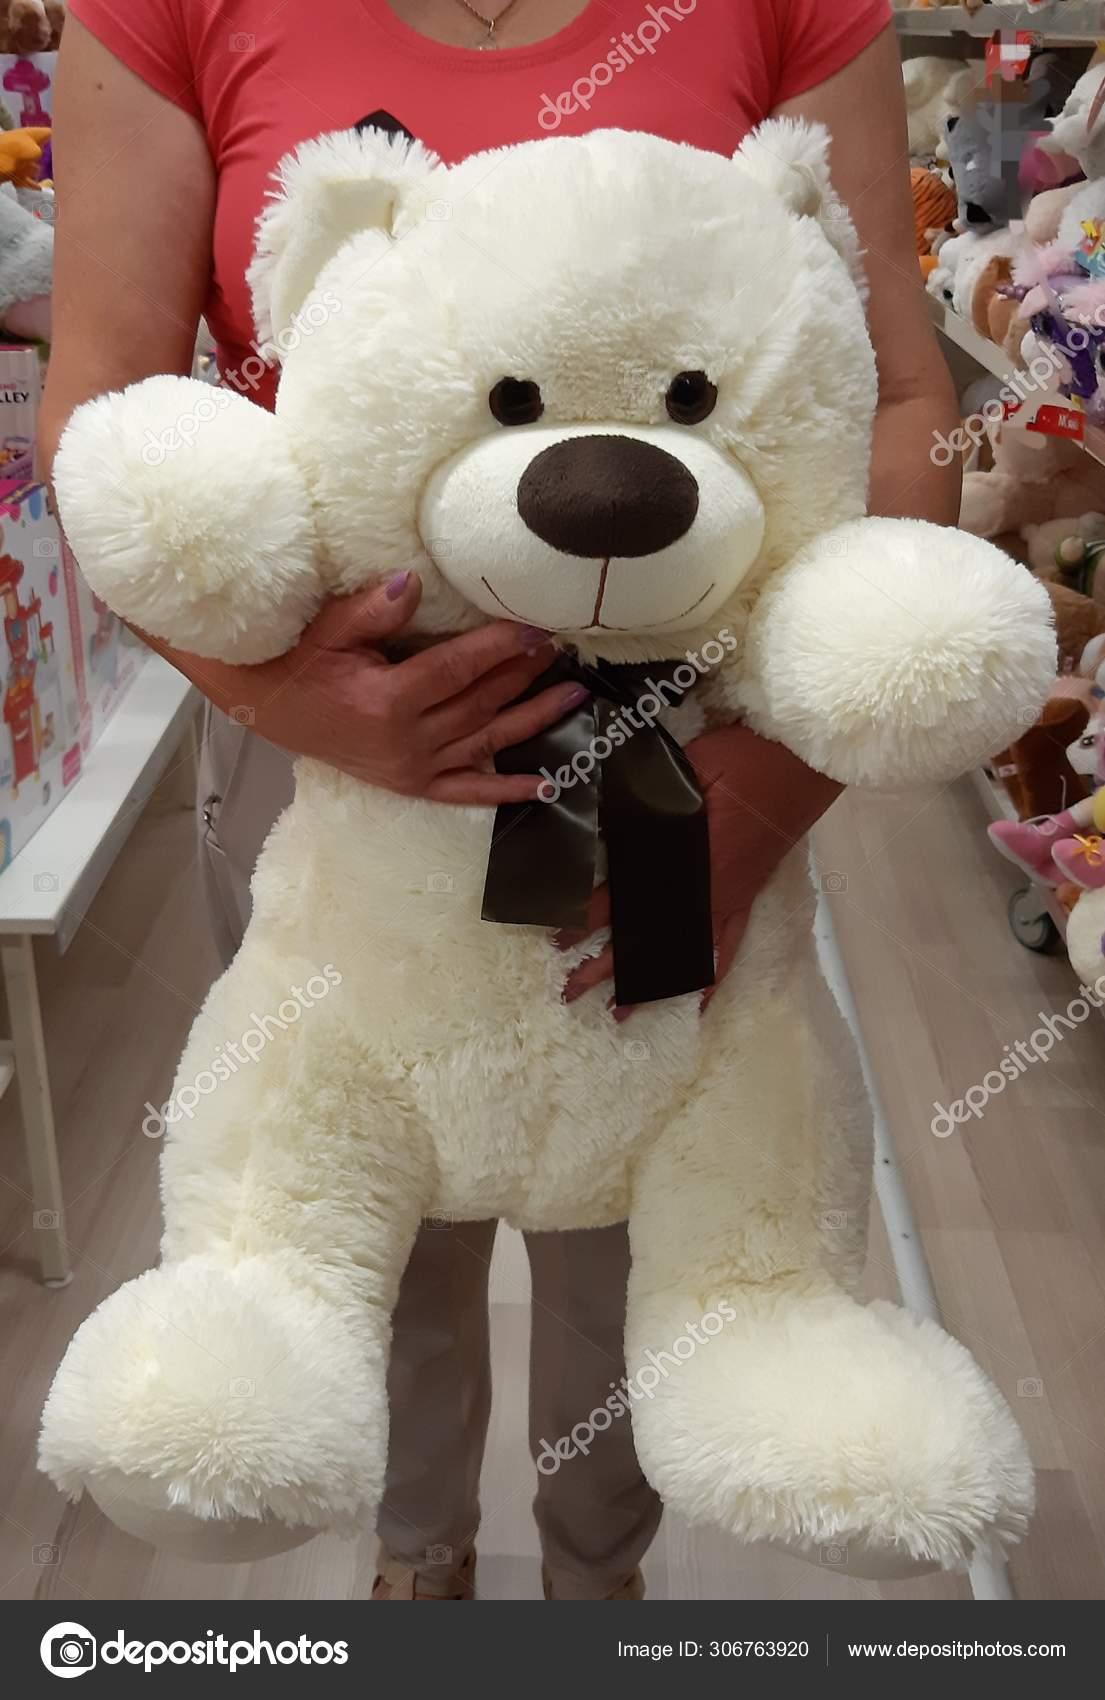 Hay Hay Chicken Stuffed Animal, Toy Shop Bought Big White Fluffy Bear Stock Photo C Agafja 306763920